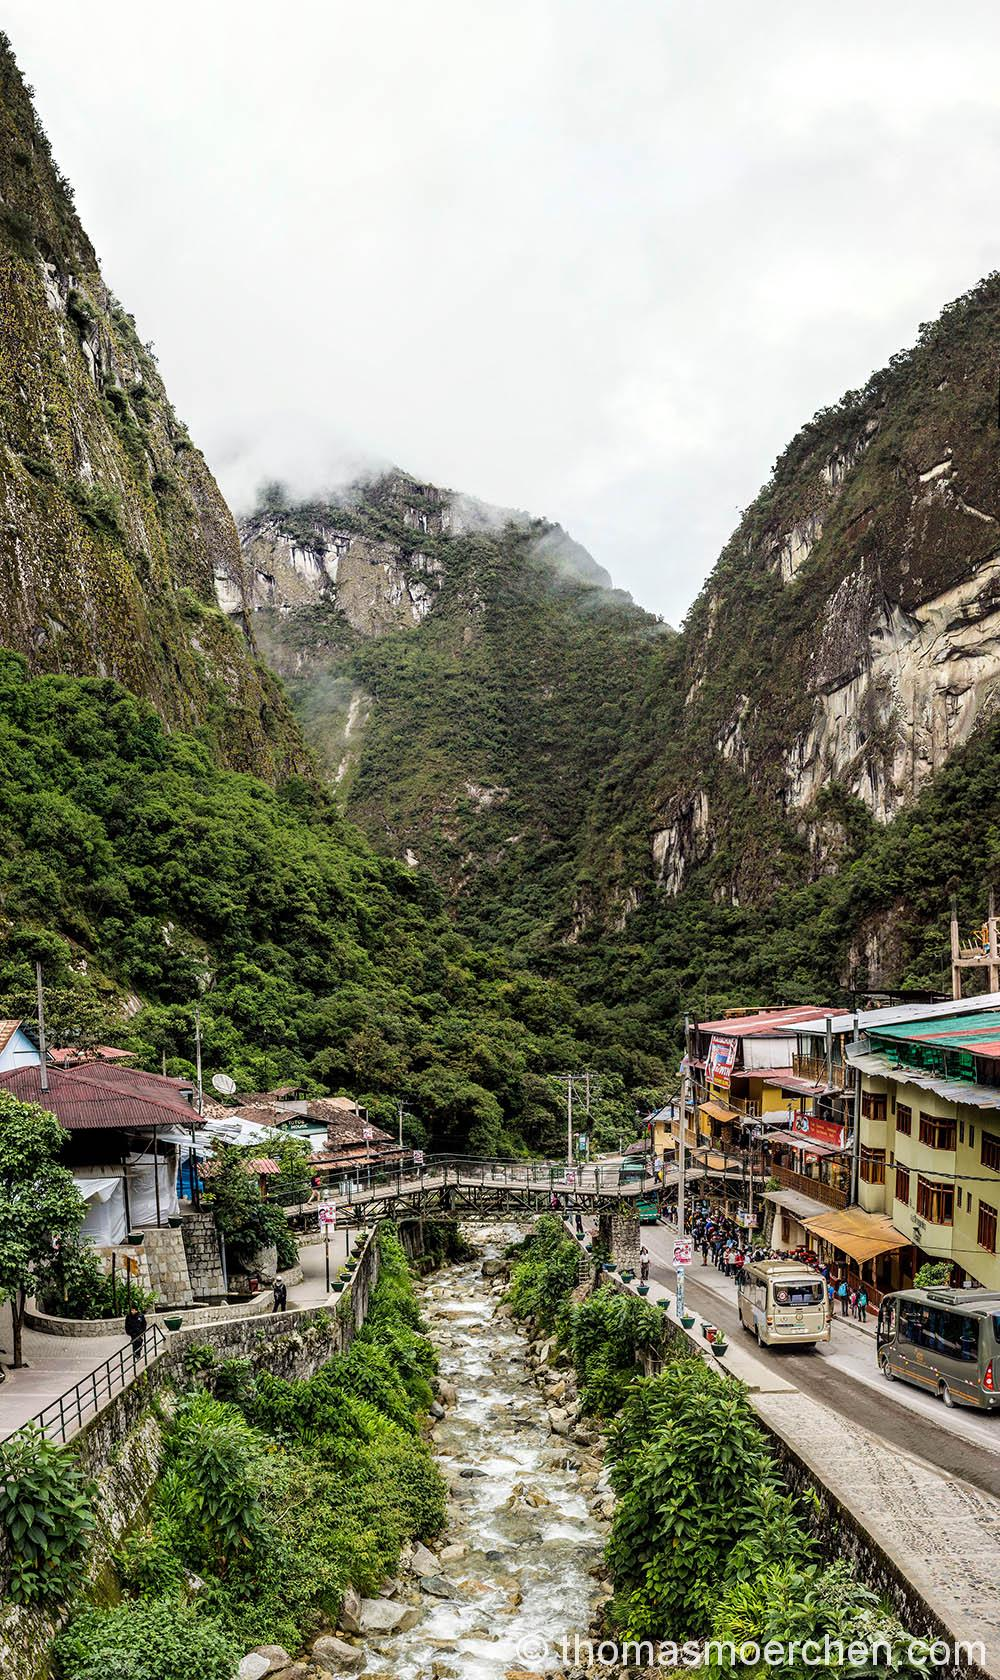 Aguas Caliente - der Startpunkt zum Machu Picchu